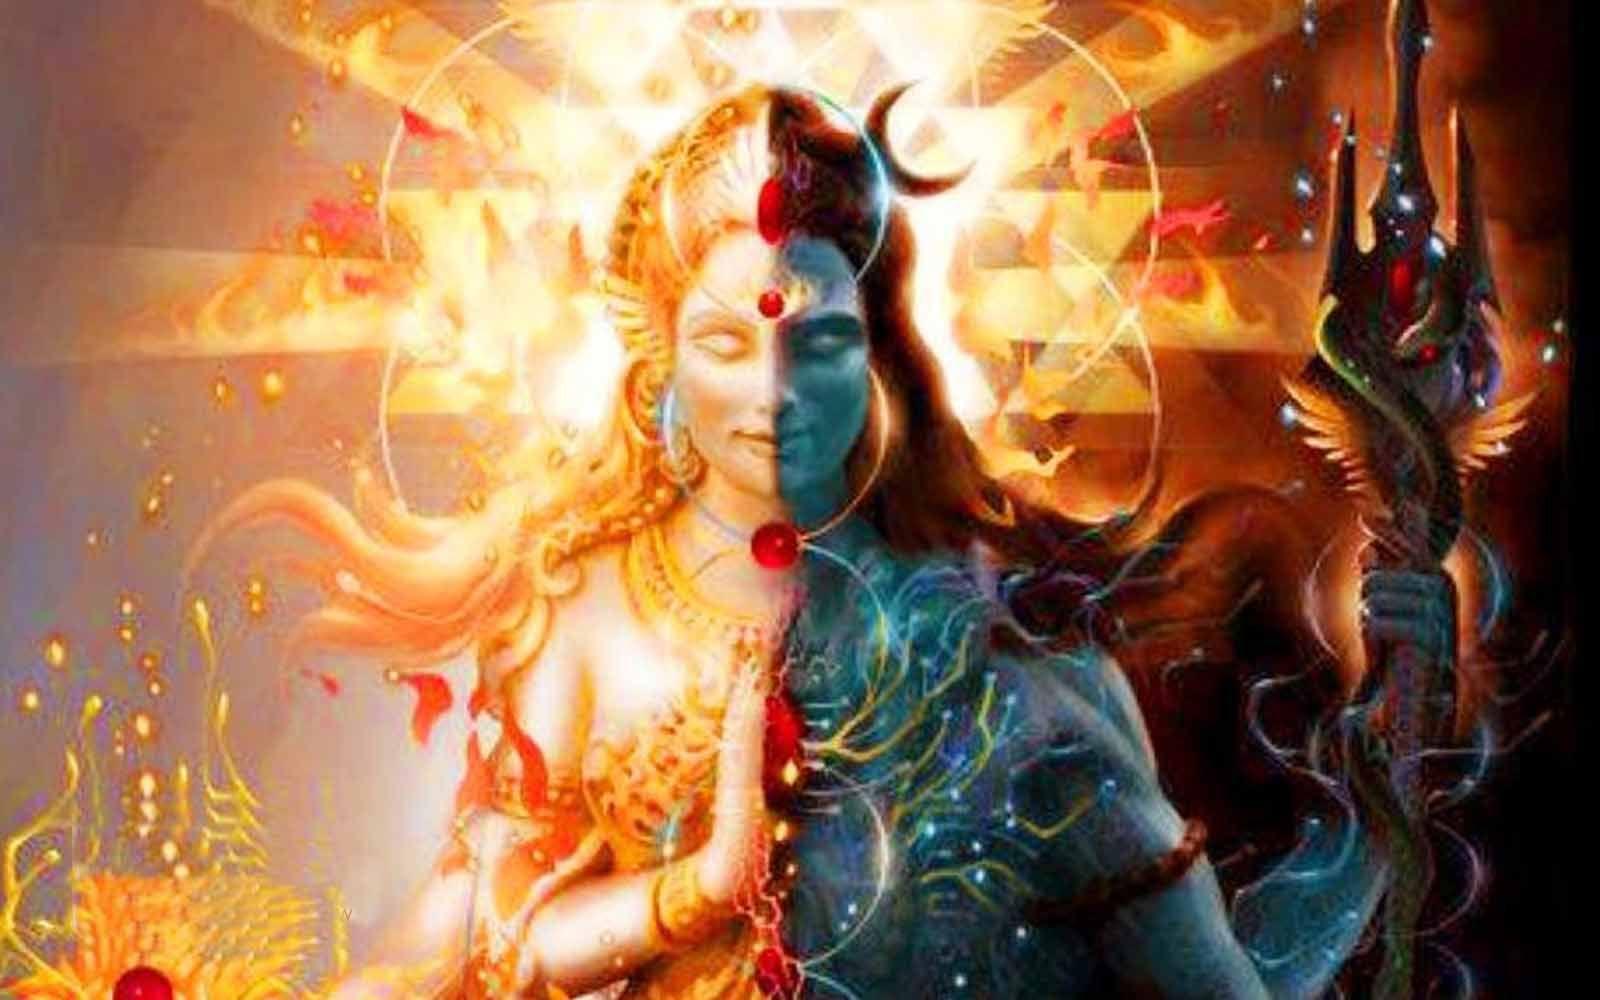 Hd wallpaper shiva - God Shiva Hd Wallpapers Free Download